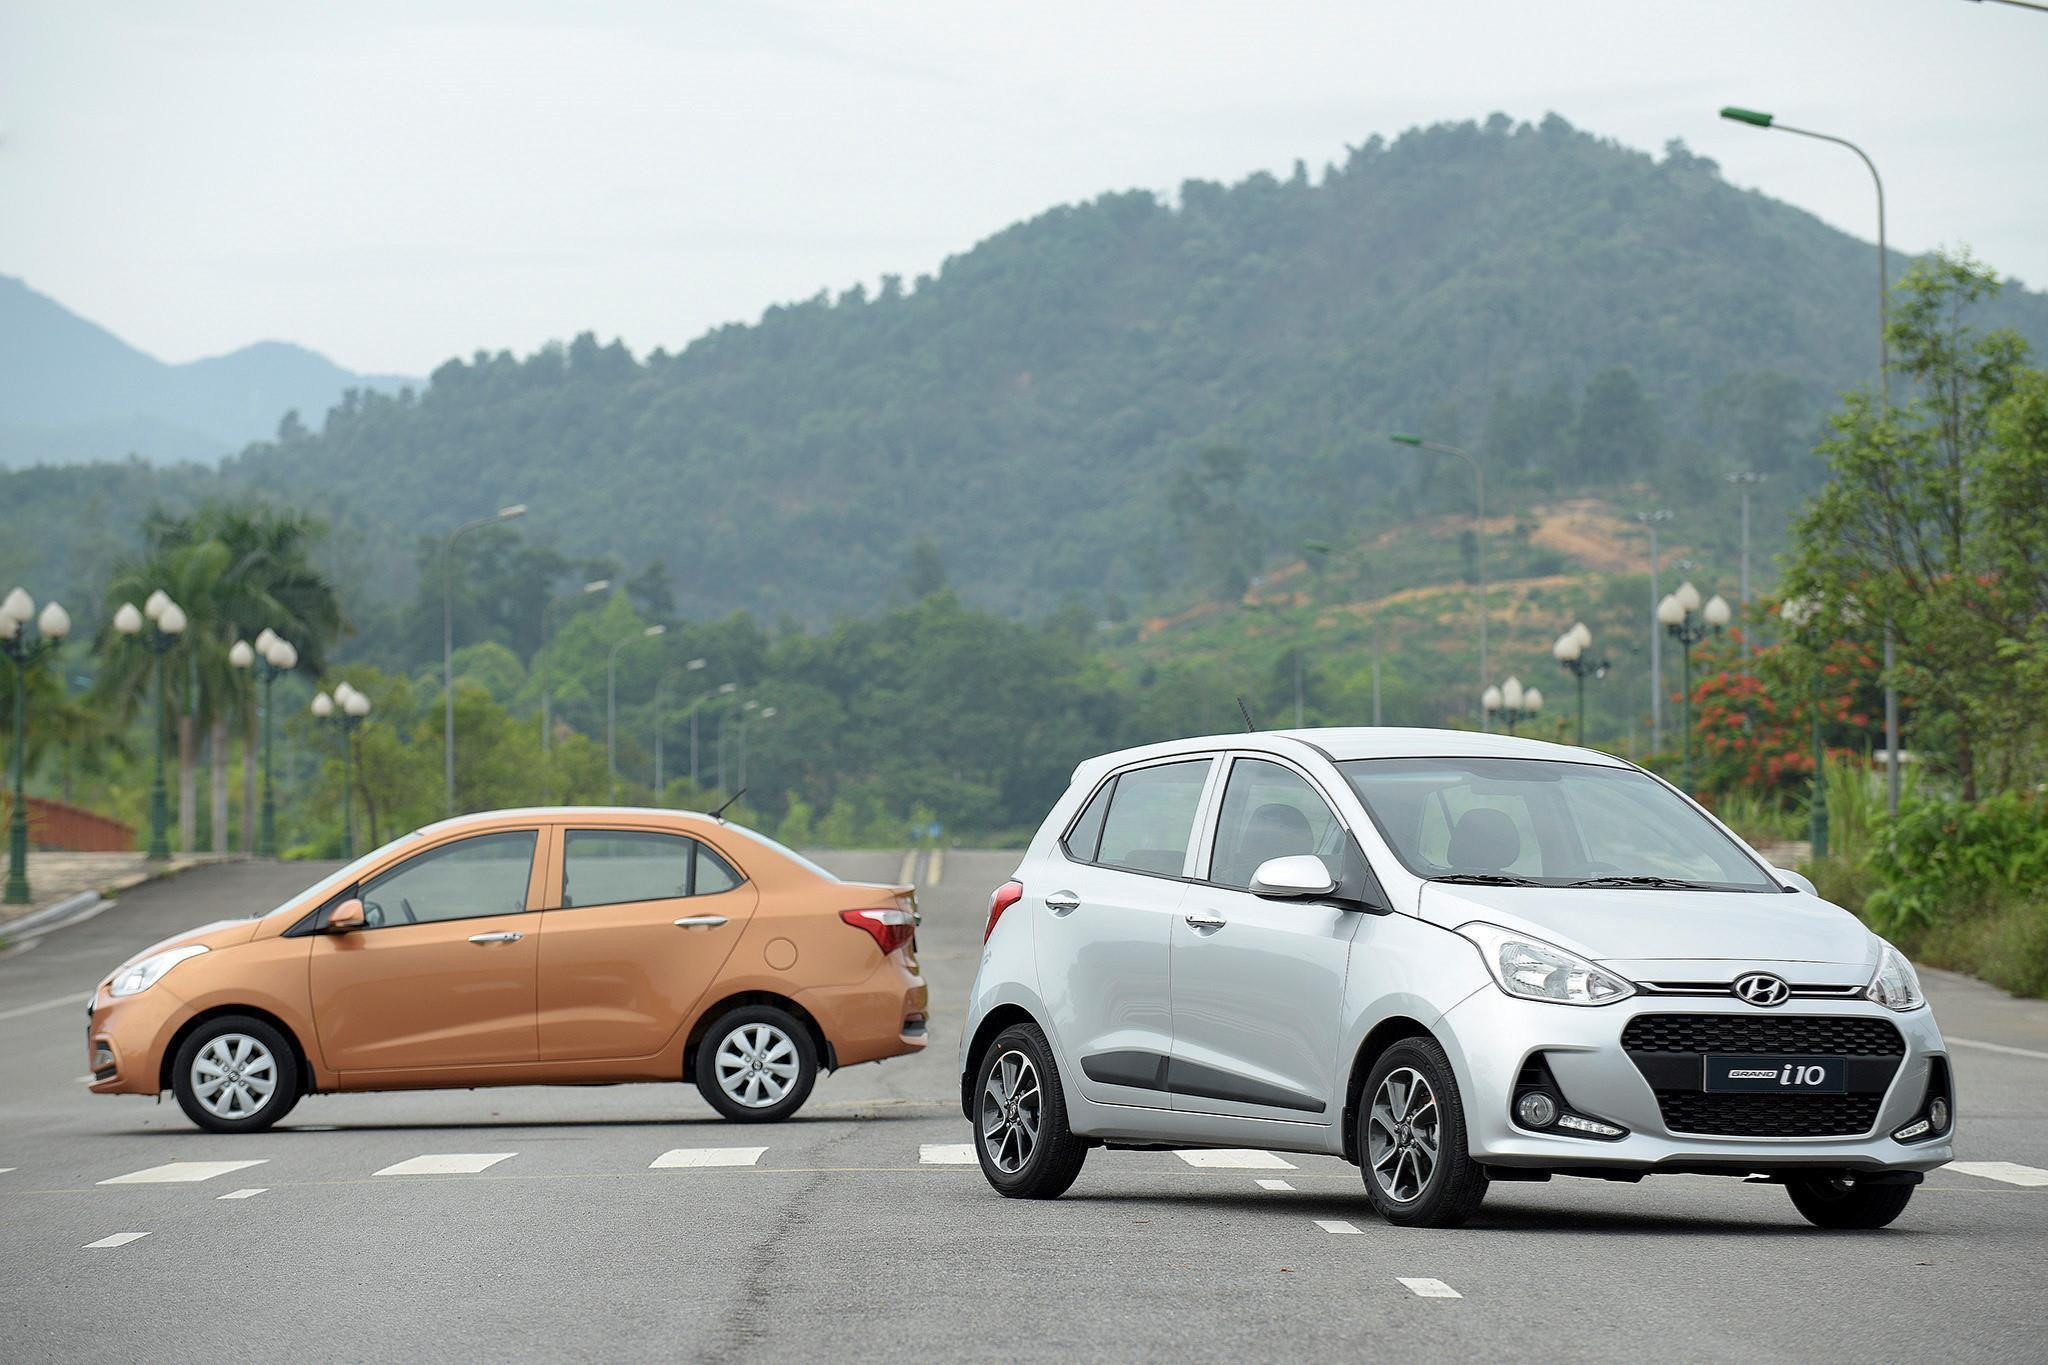 Vios van ban chay nhat Viet Nam du Xpander bam phia sau hinh anh 4 Hyundai_Grand_i10_2.jpg